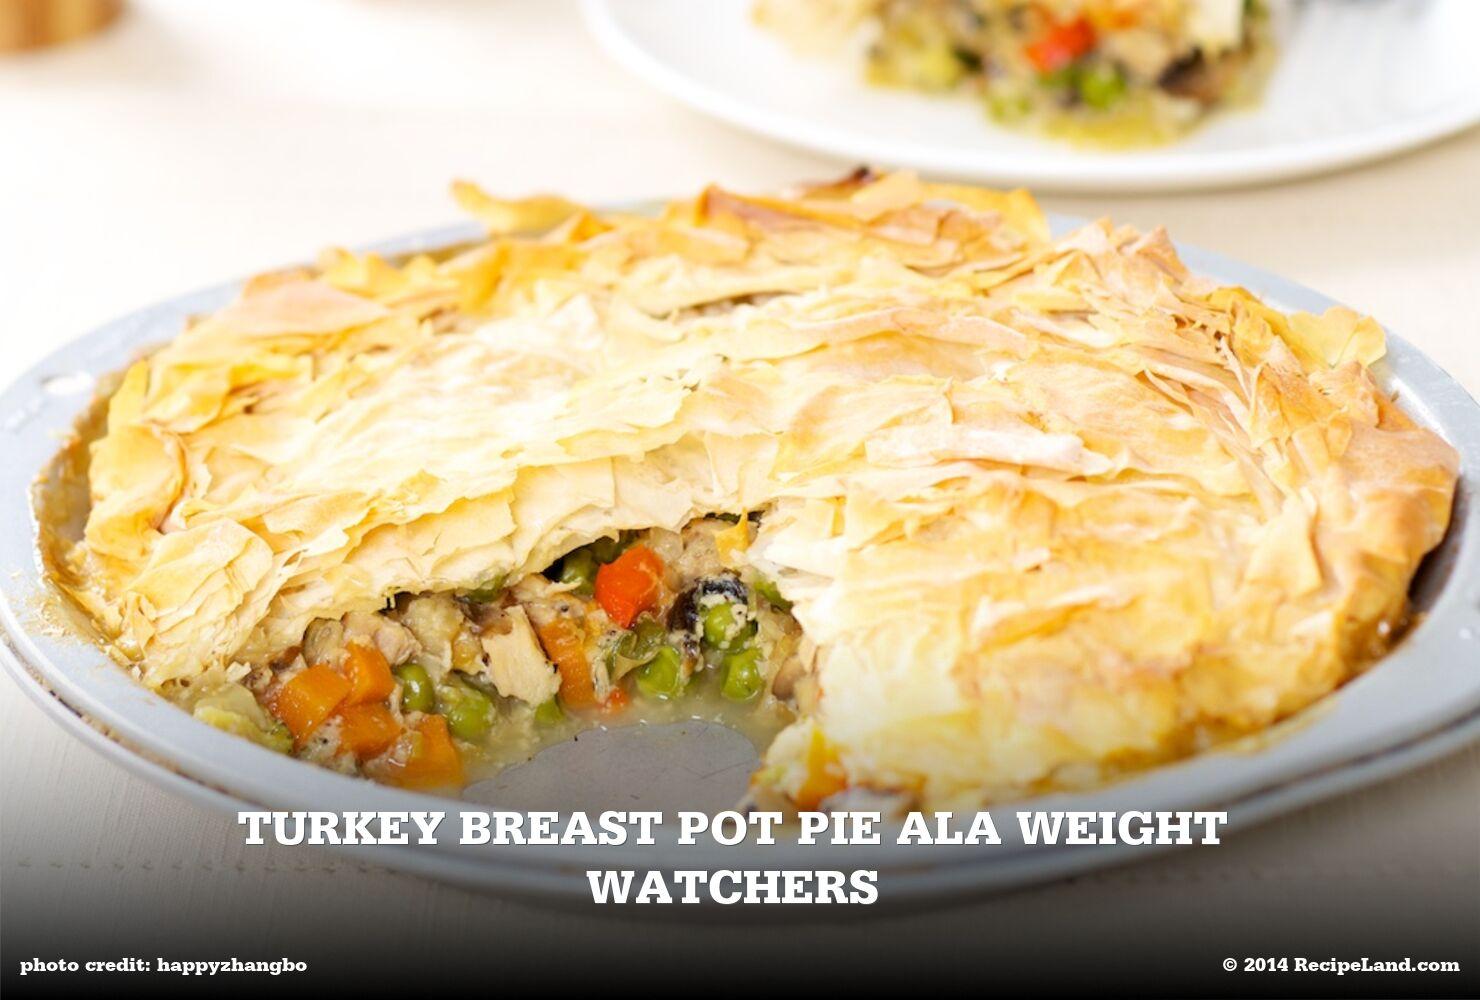 Turkey Breast Pot Pie Ala Weight Watchers